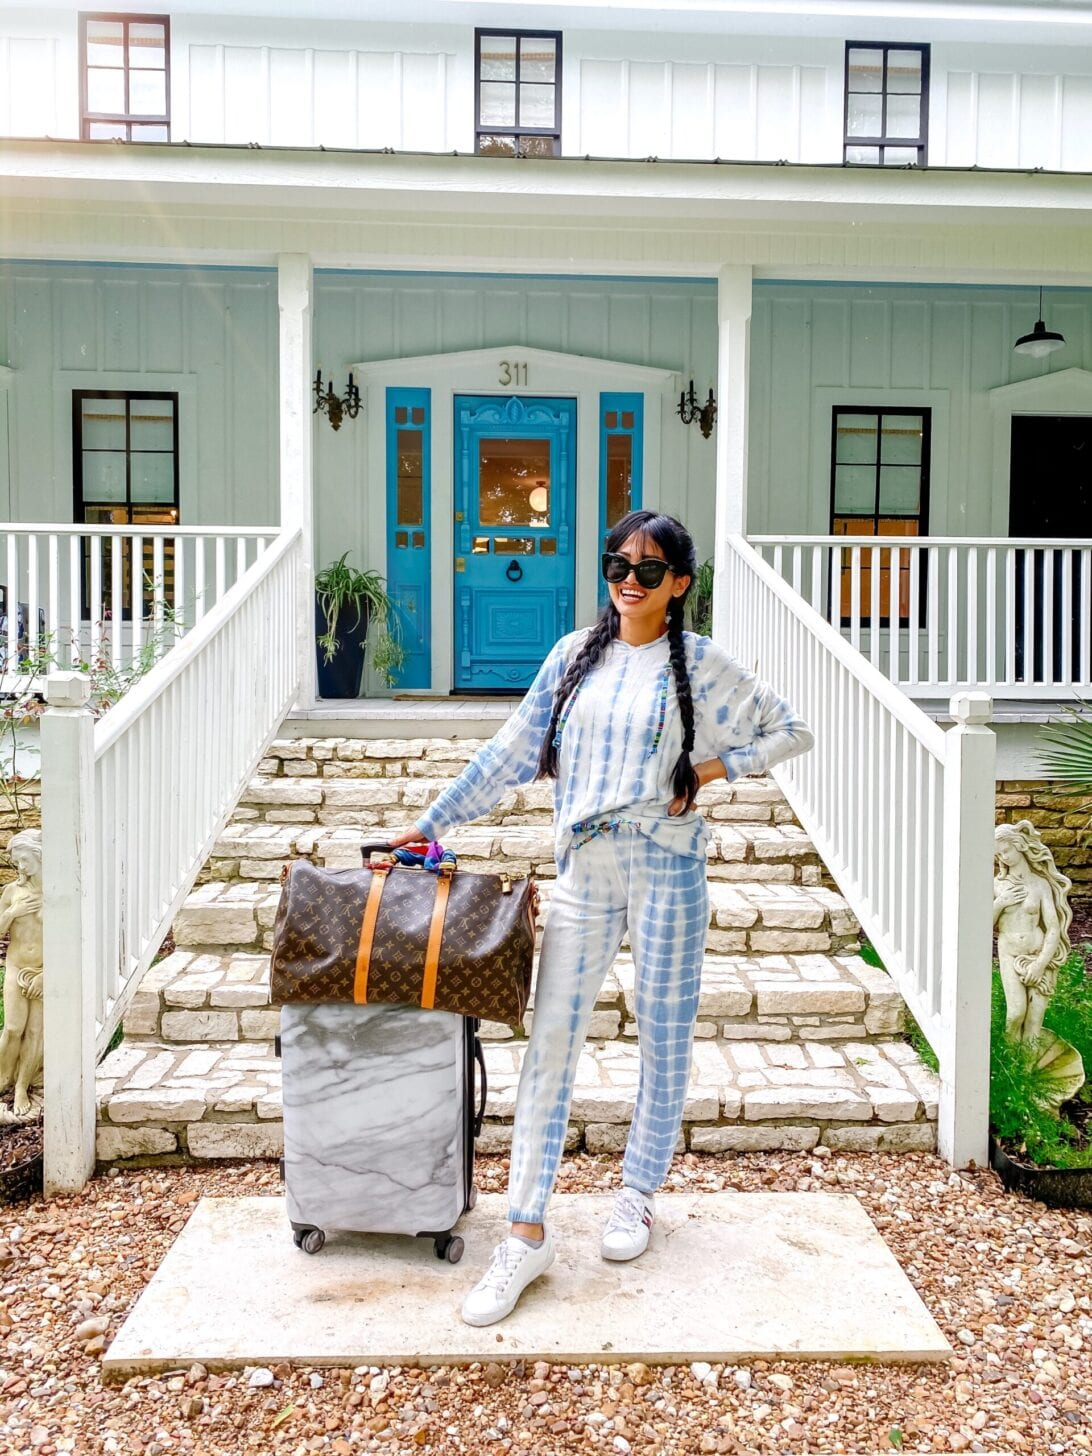 tie dye jogger set, travel style, Calpak luggage, Louis Vuitton carryall